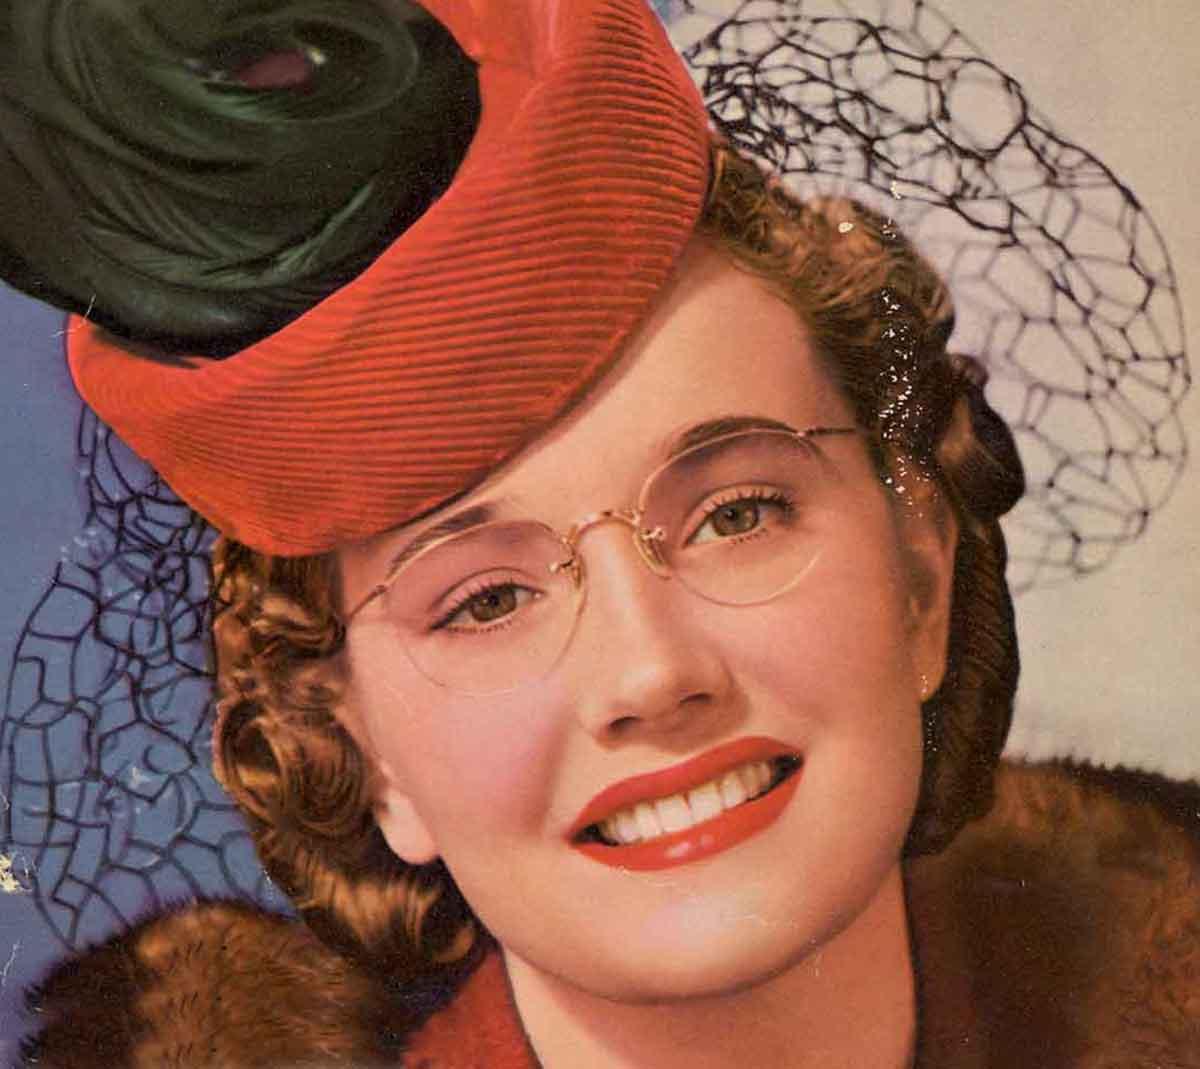 Girls Who Wear Glasses - 1940s Beauty Tips | Glamour Daze